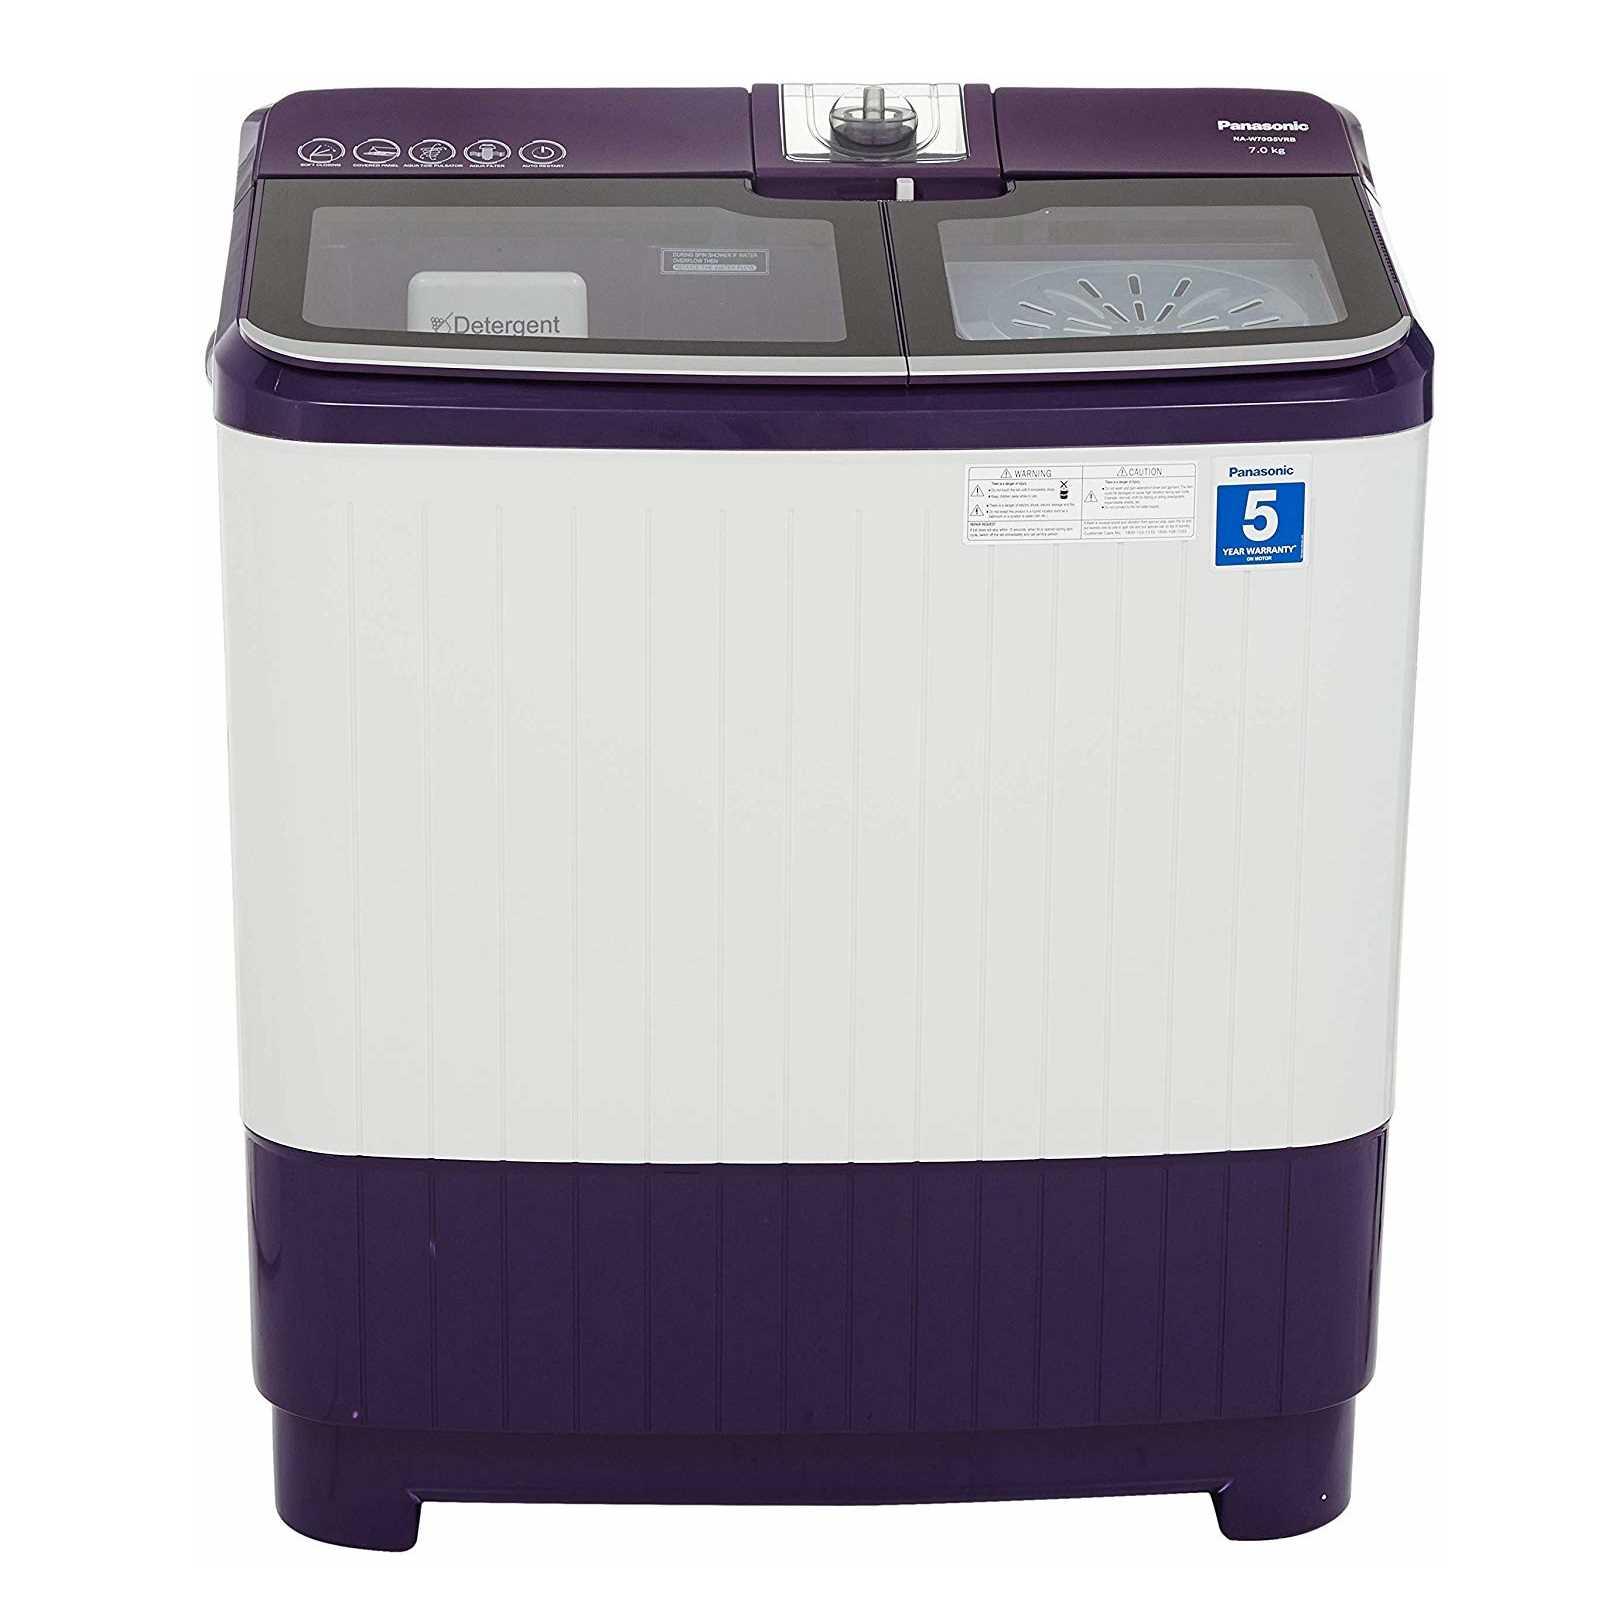 Panasonic NA W70G5VRB 7 Kg Semi Automatic Top Loading Washing Machine